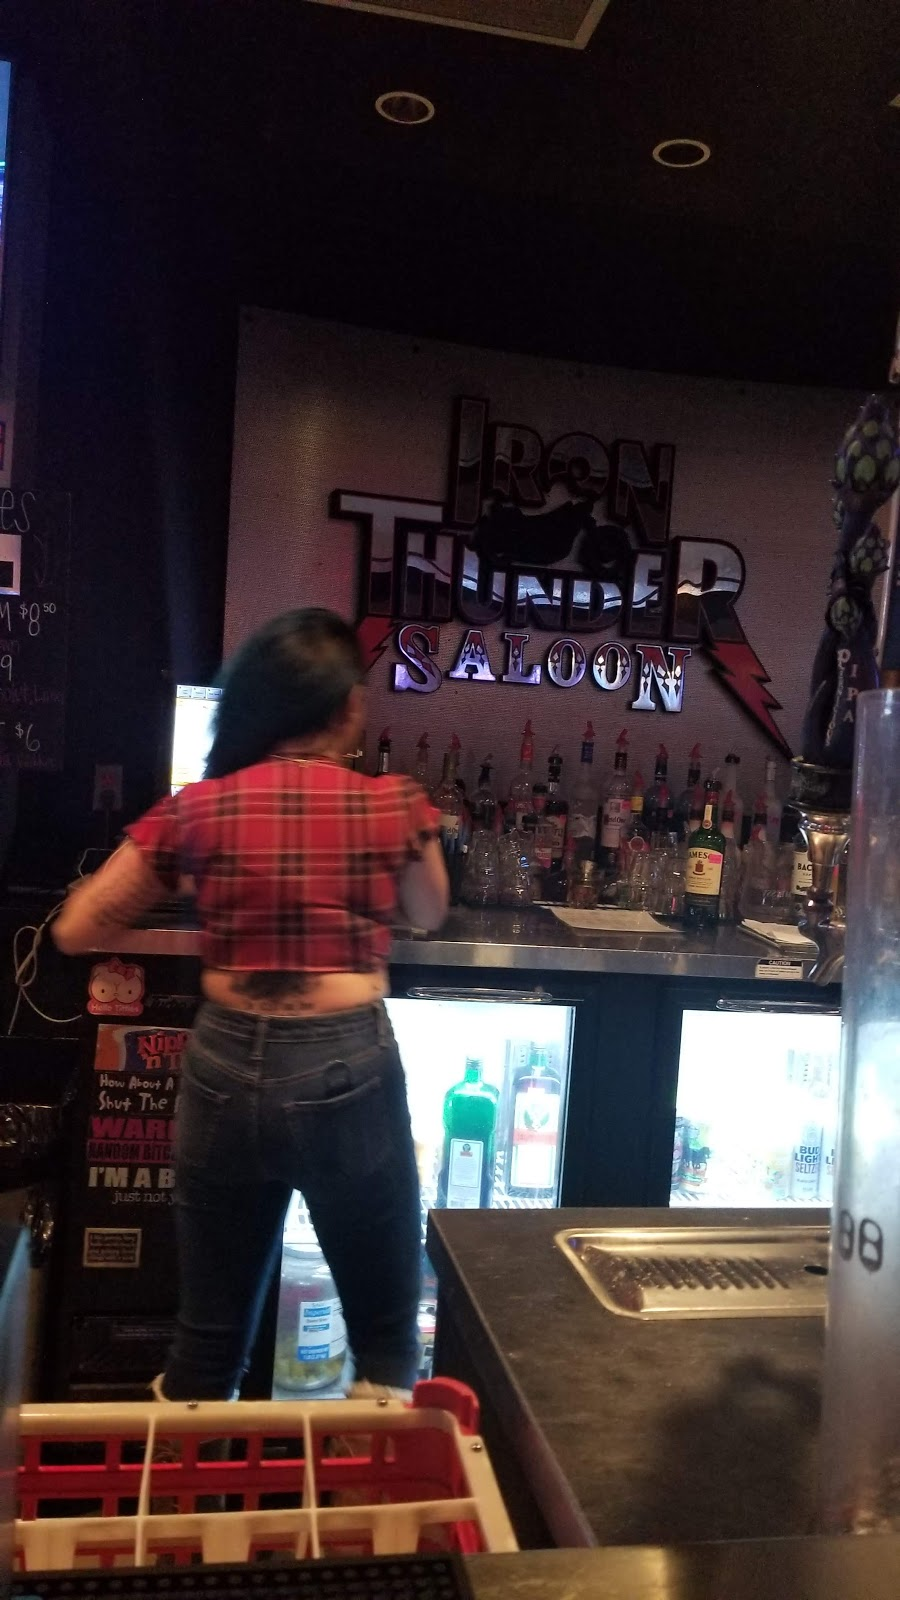 Iron Thunder Saloon & Grill Concord - restaurant  | Photo 7 of 10 | Address: 10023 Weddington Rd Ext., Concord, NC 28027, USA | Phone: (704) 979-3888